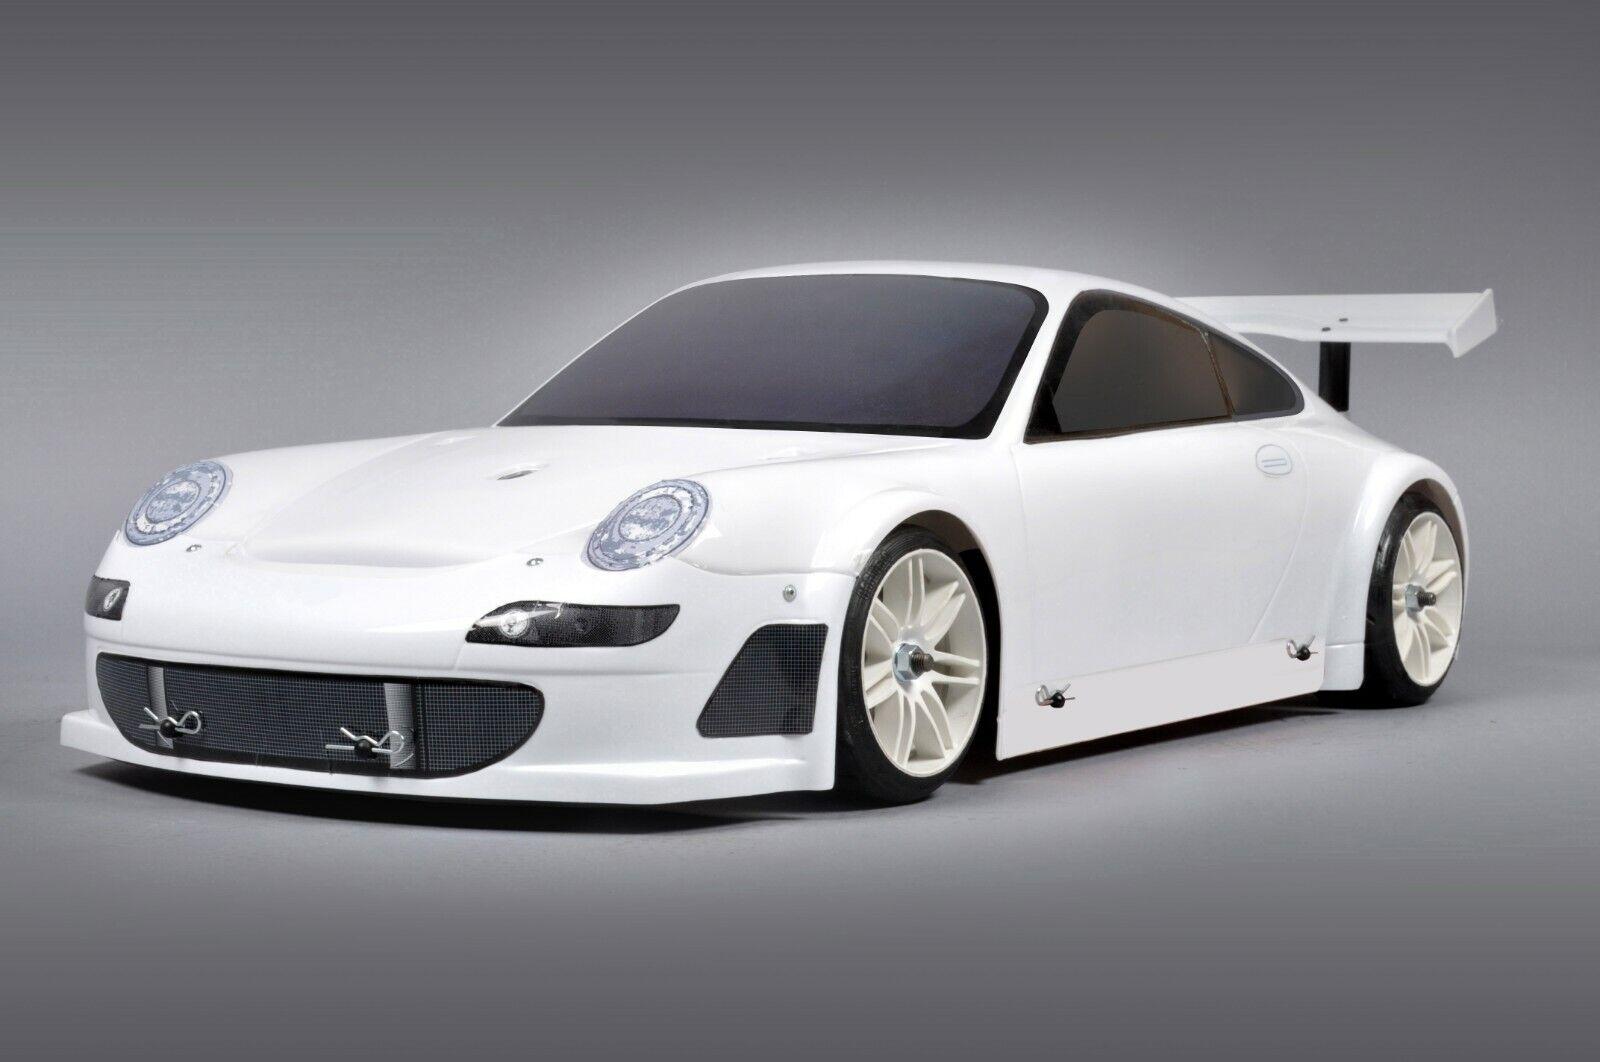 Fg modellolsport  155170r 4wd 510 Telaio Porsche Non Verniciato Verniciato Verniciato 26 Ccm Rtr 27e2fe